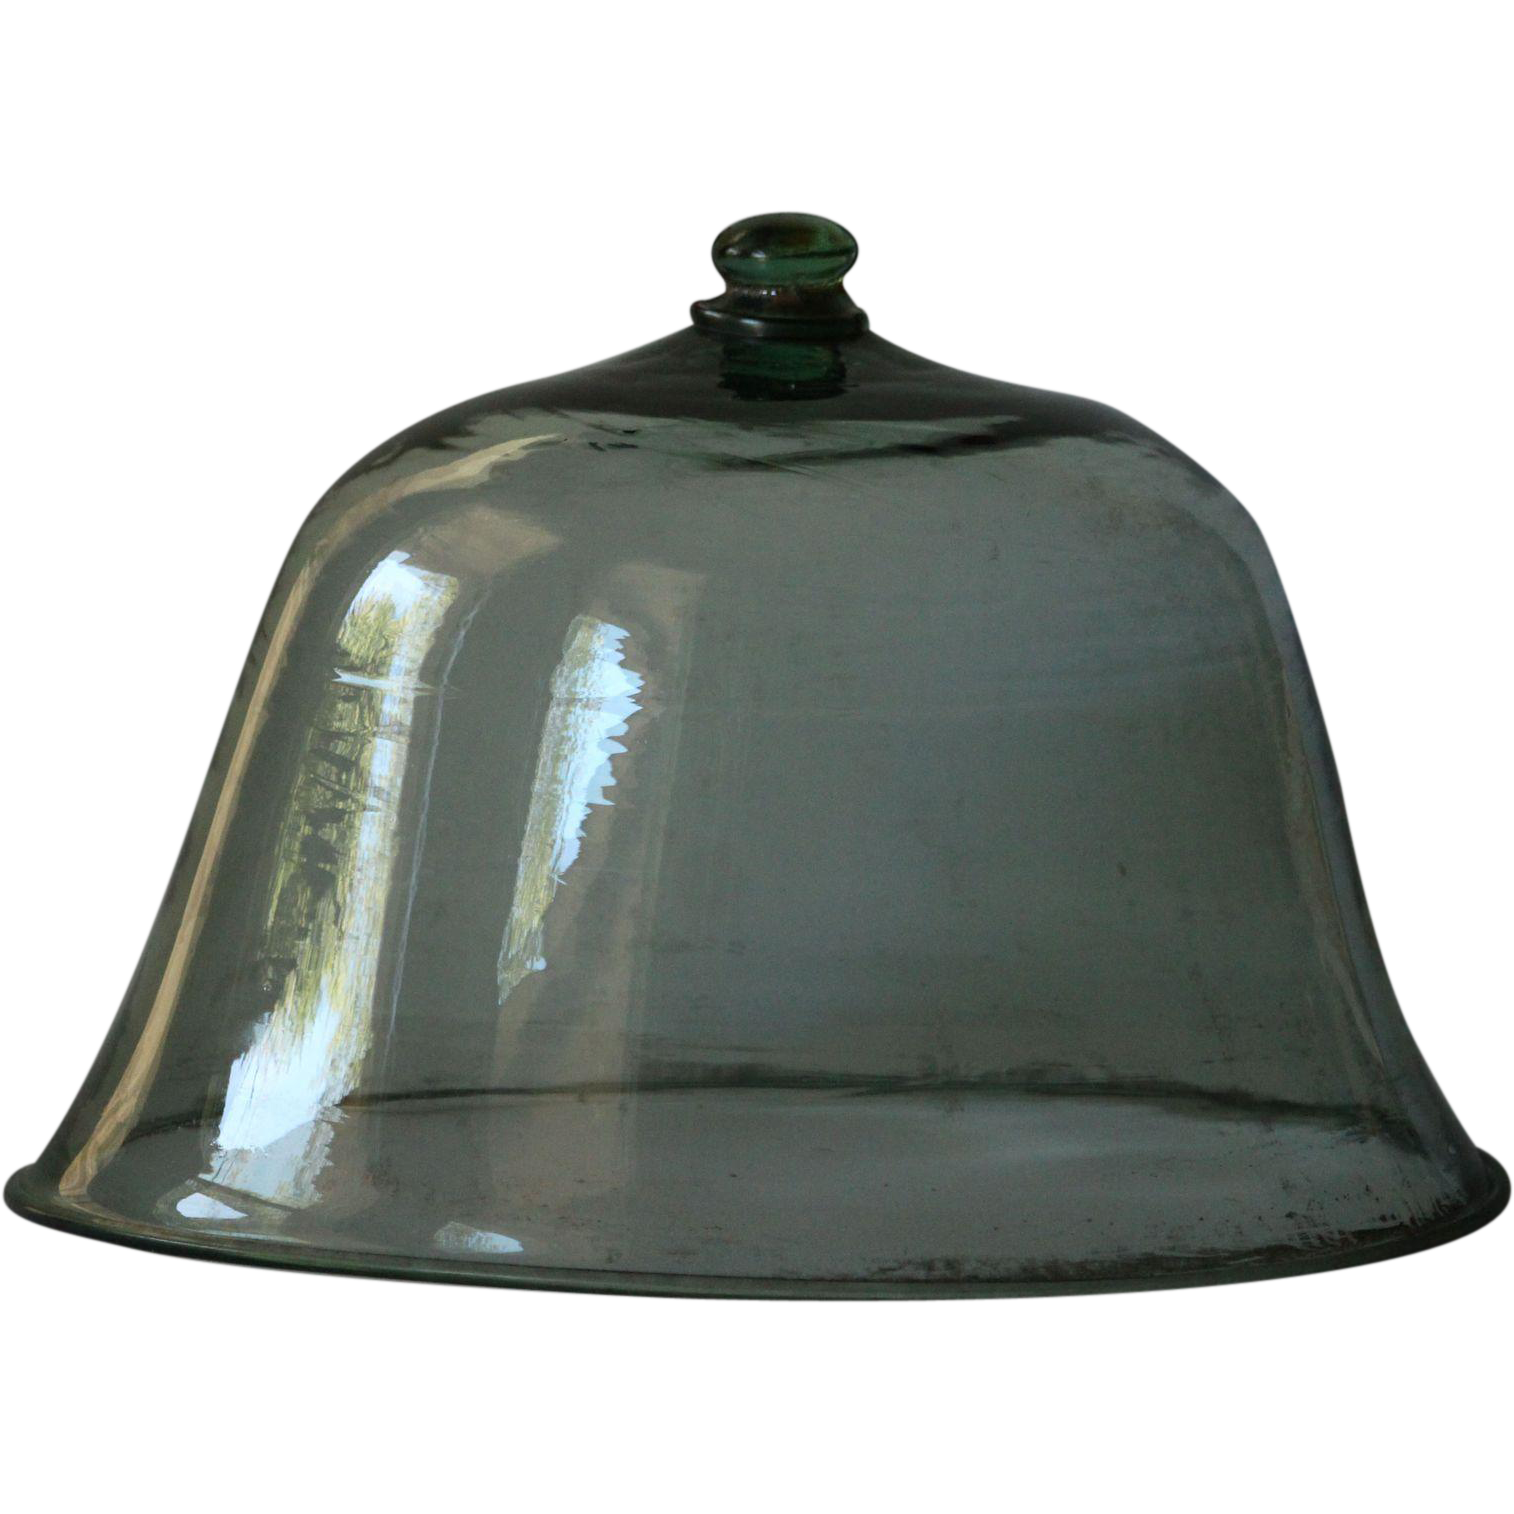 19th Century Glass Melon Cloche - Antique Garden Bell Jar - Glass Dome